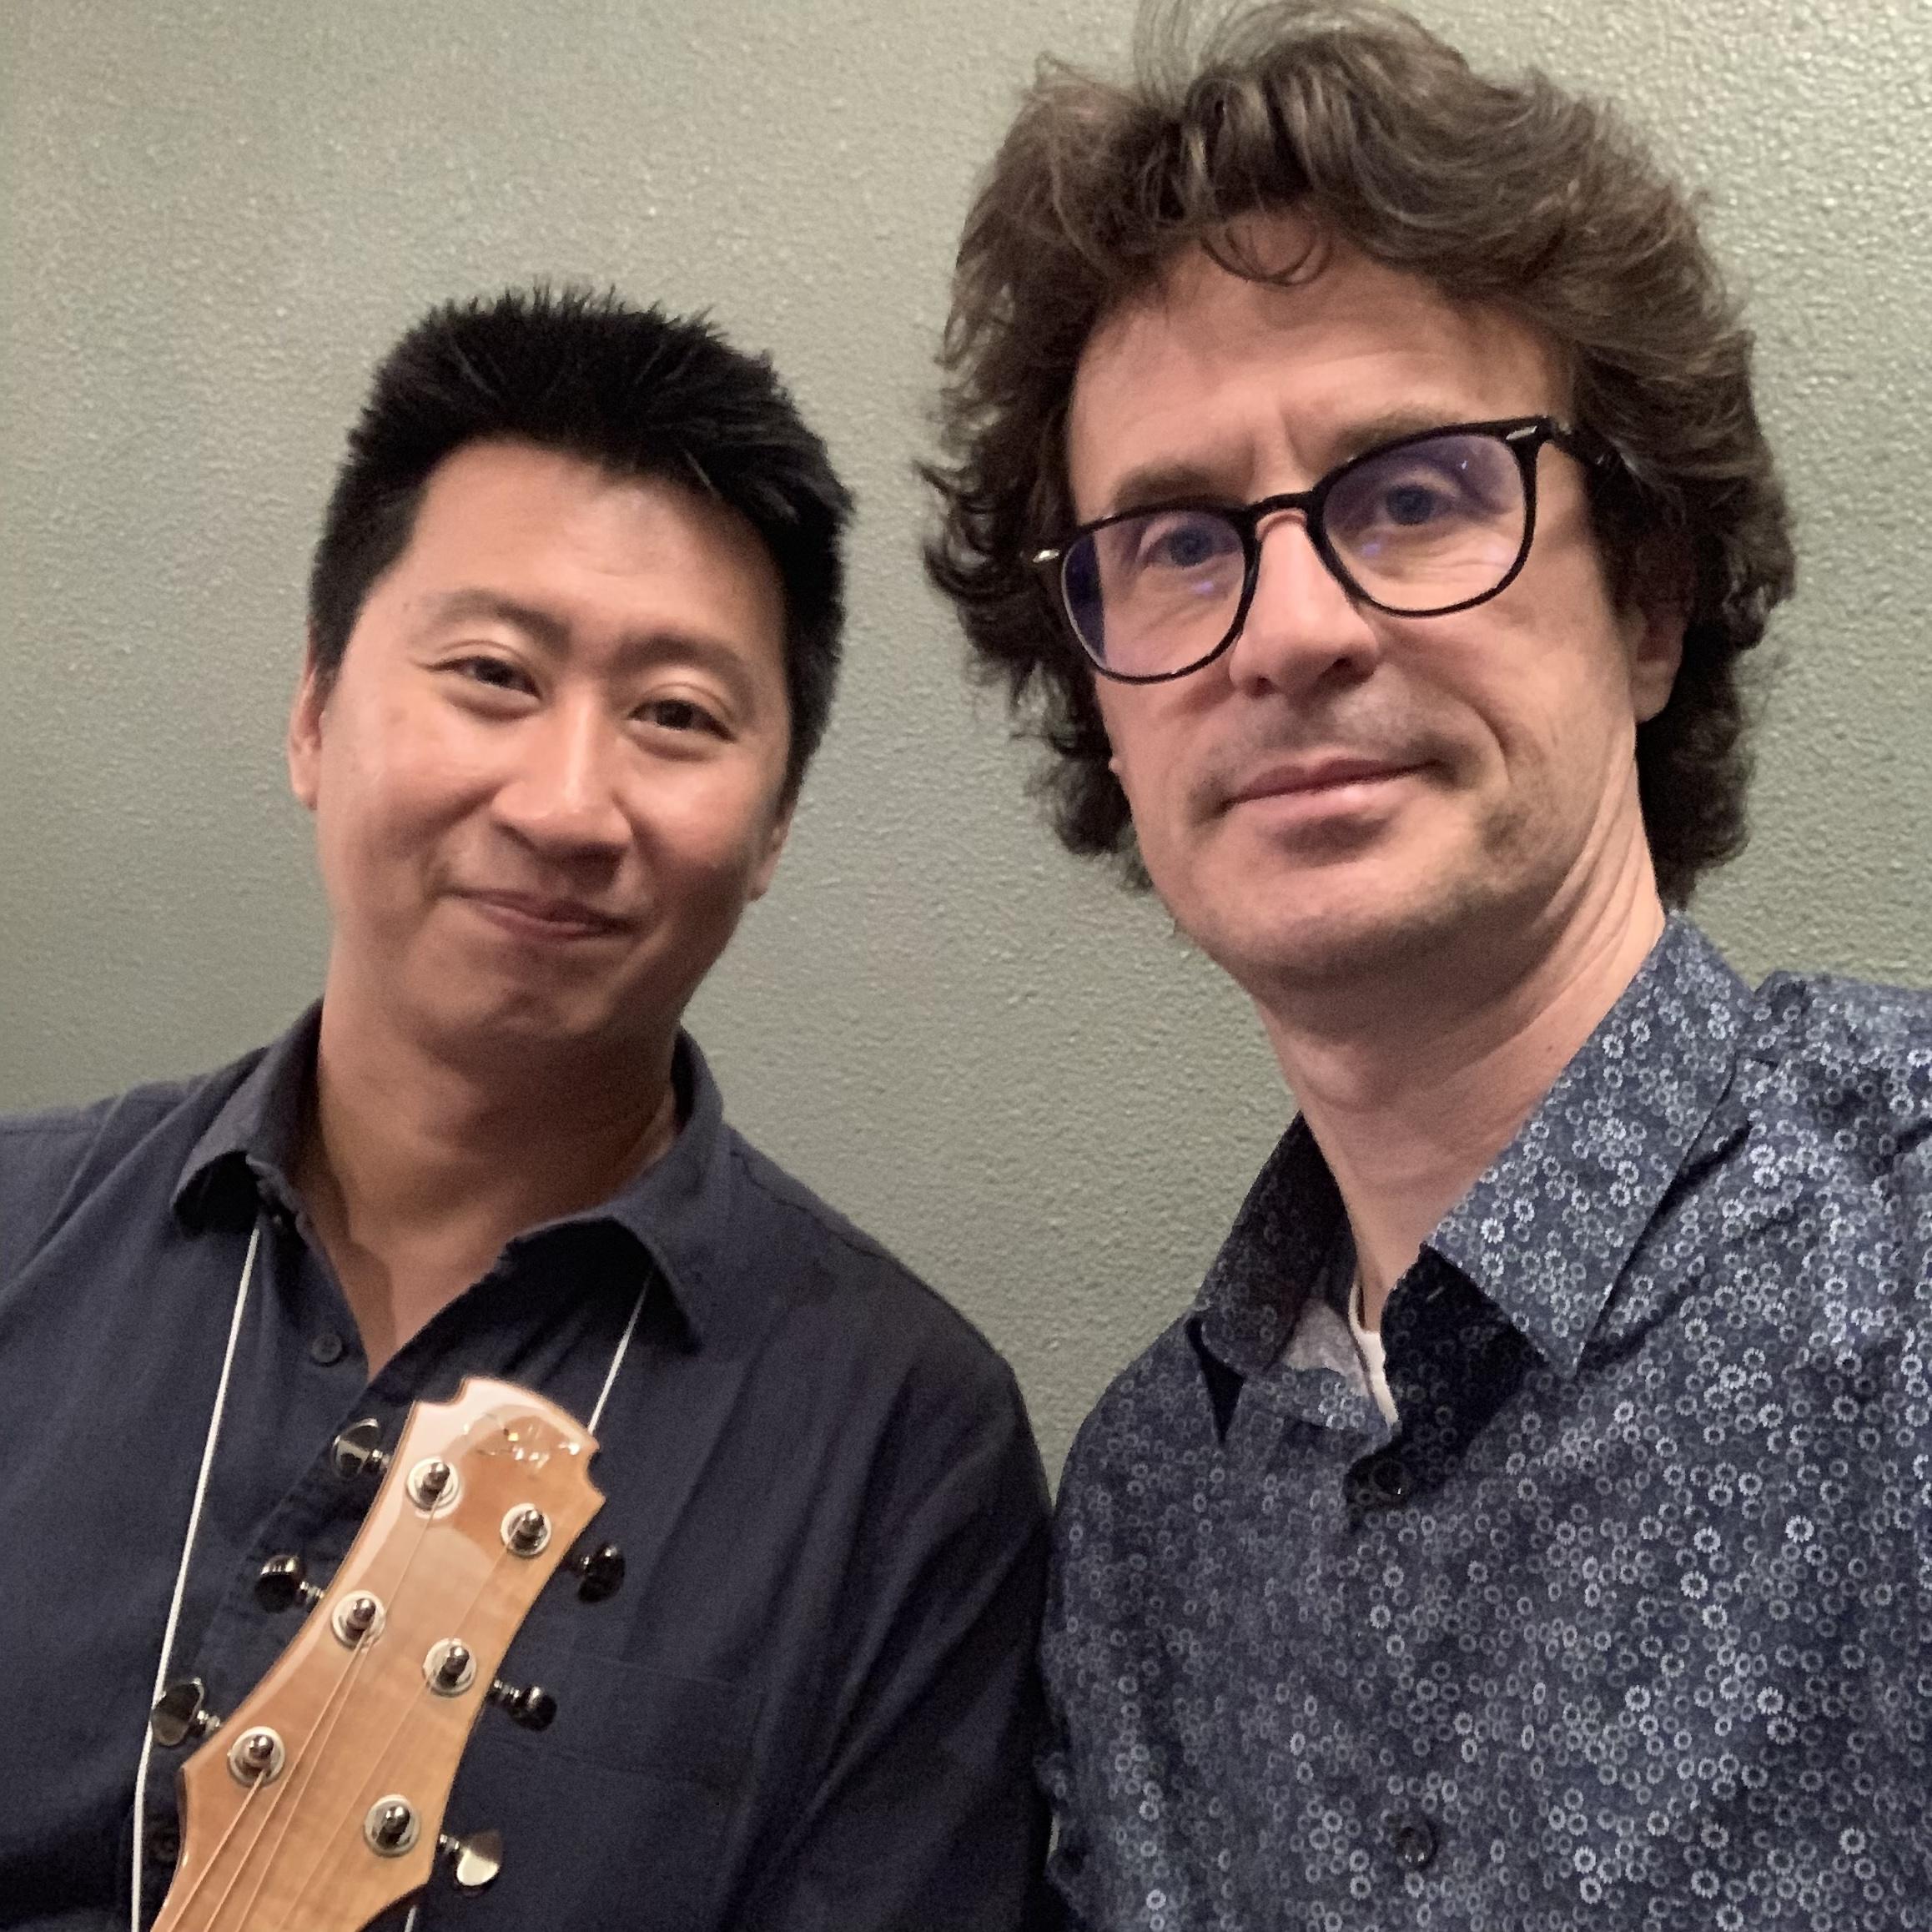 Ho Zen luthier interview - Maestro Guitars - 2019 Sound Messe Osaka